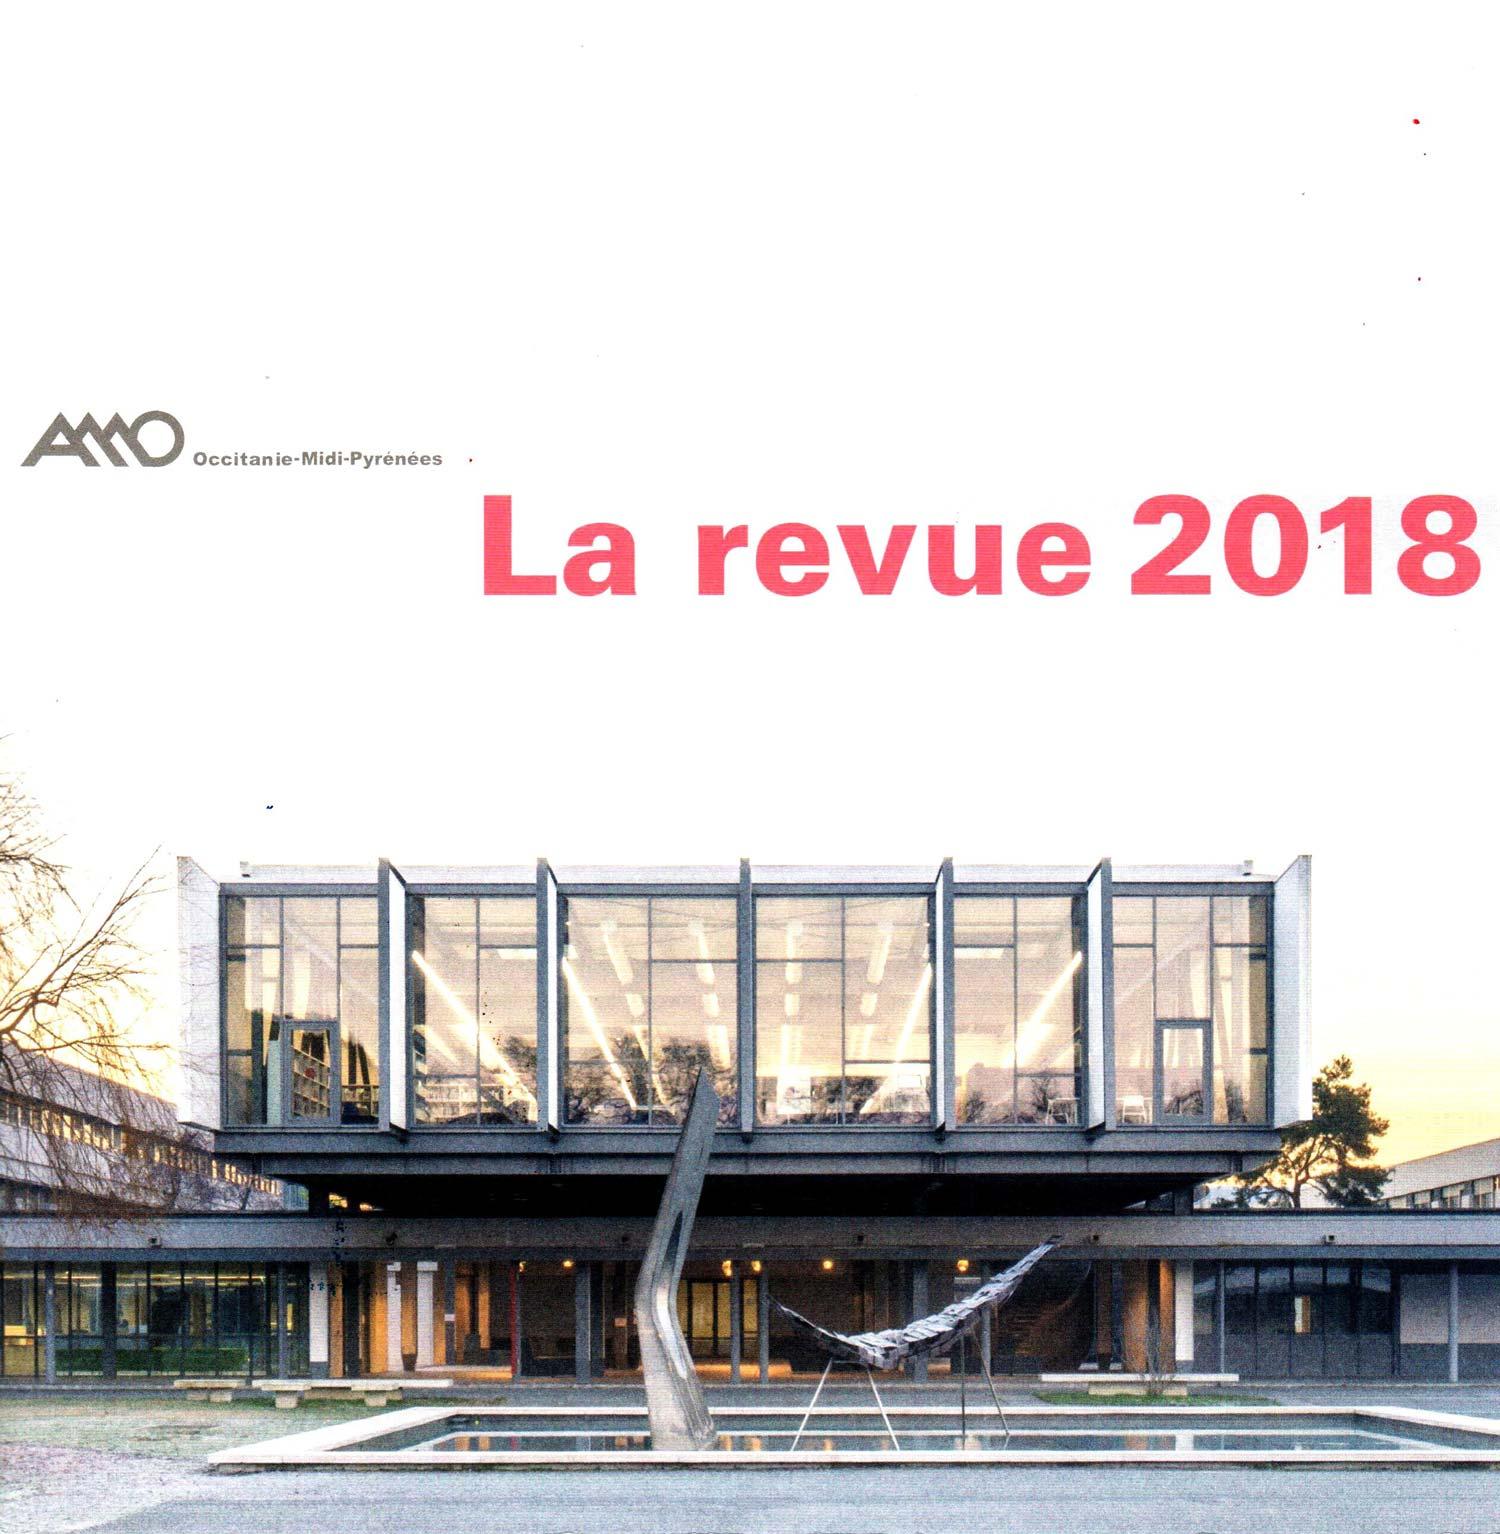 AMO Occitanie-Midi-Pyrénées – La Revue 2018